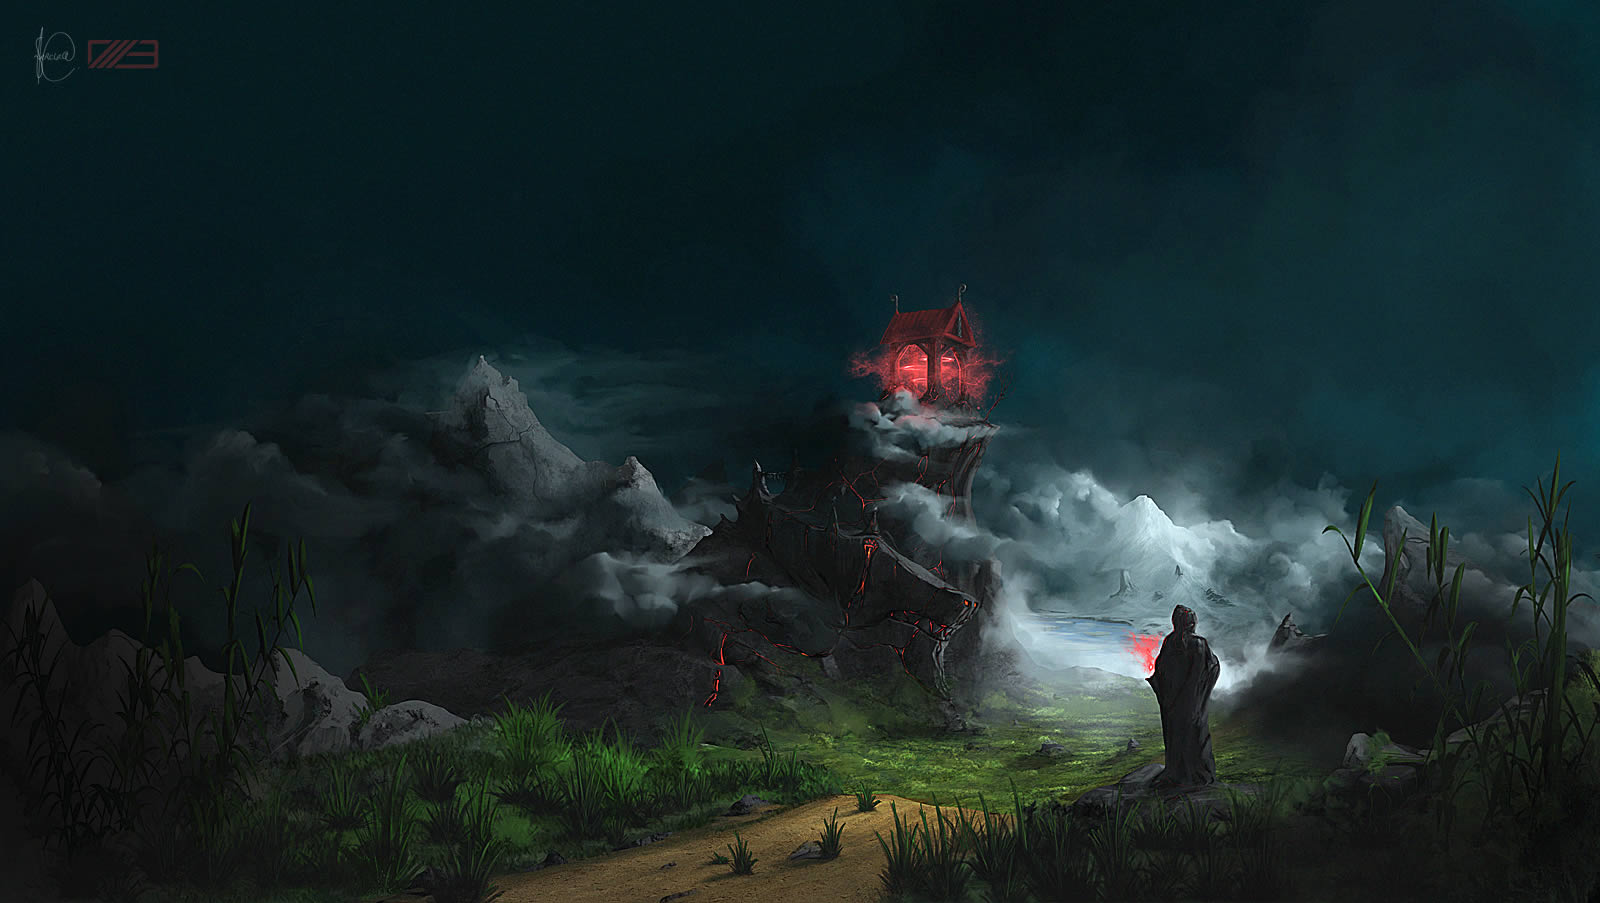 Dodge Car Wallpaper Create A Fantasy Landscape Using Digital Painting Techniques